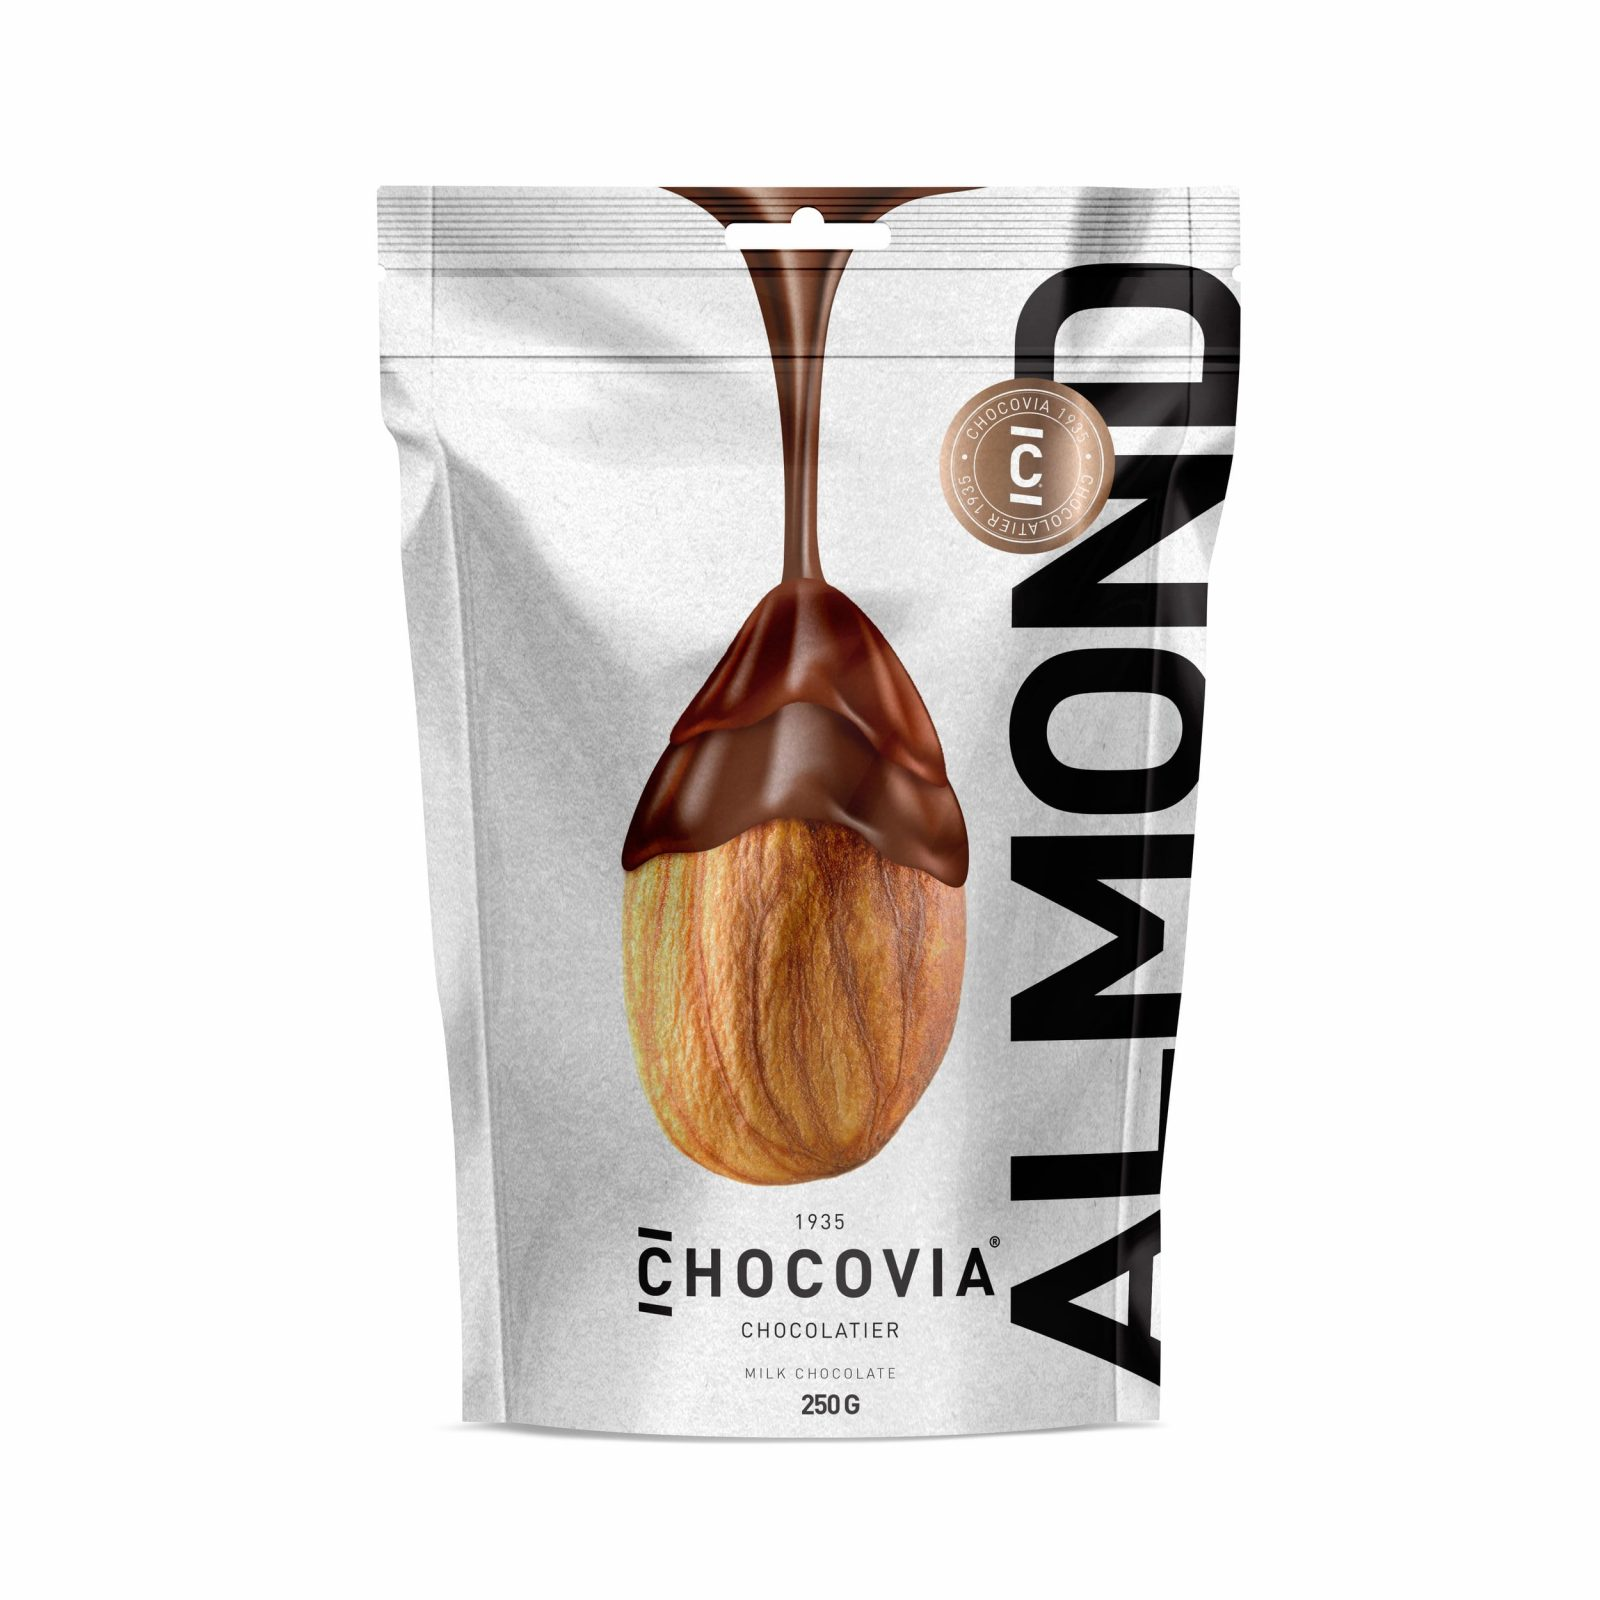 Chocovia Packaging Design